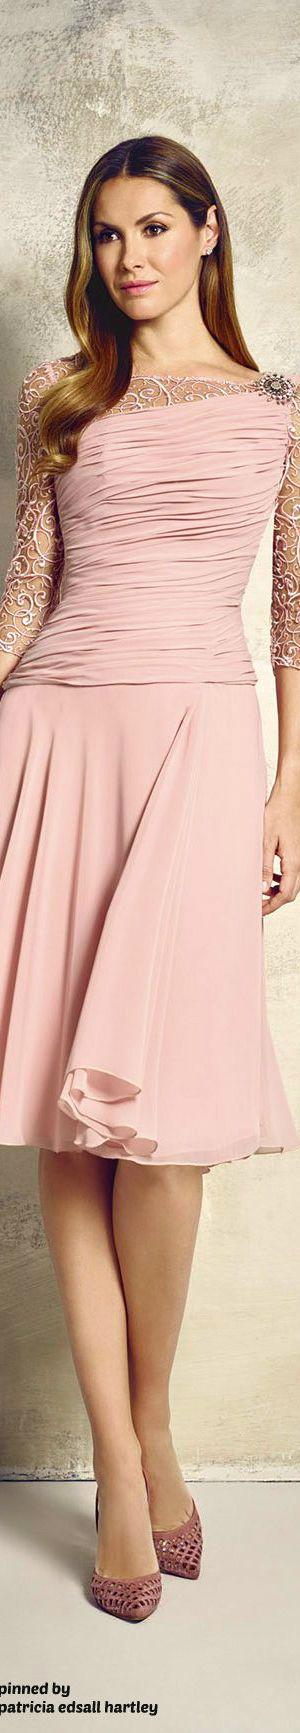 Mejores 166 imágenes de Blush !!! en Pinterest | Moda rosada, Rosas ...